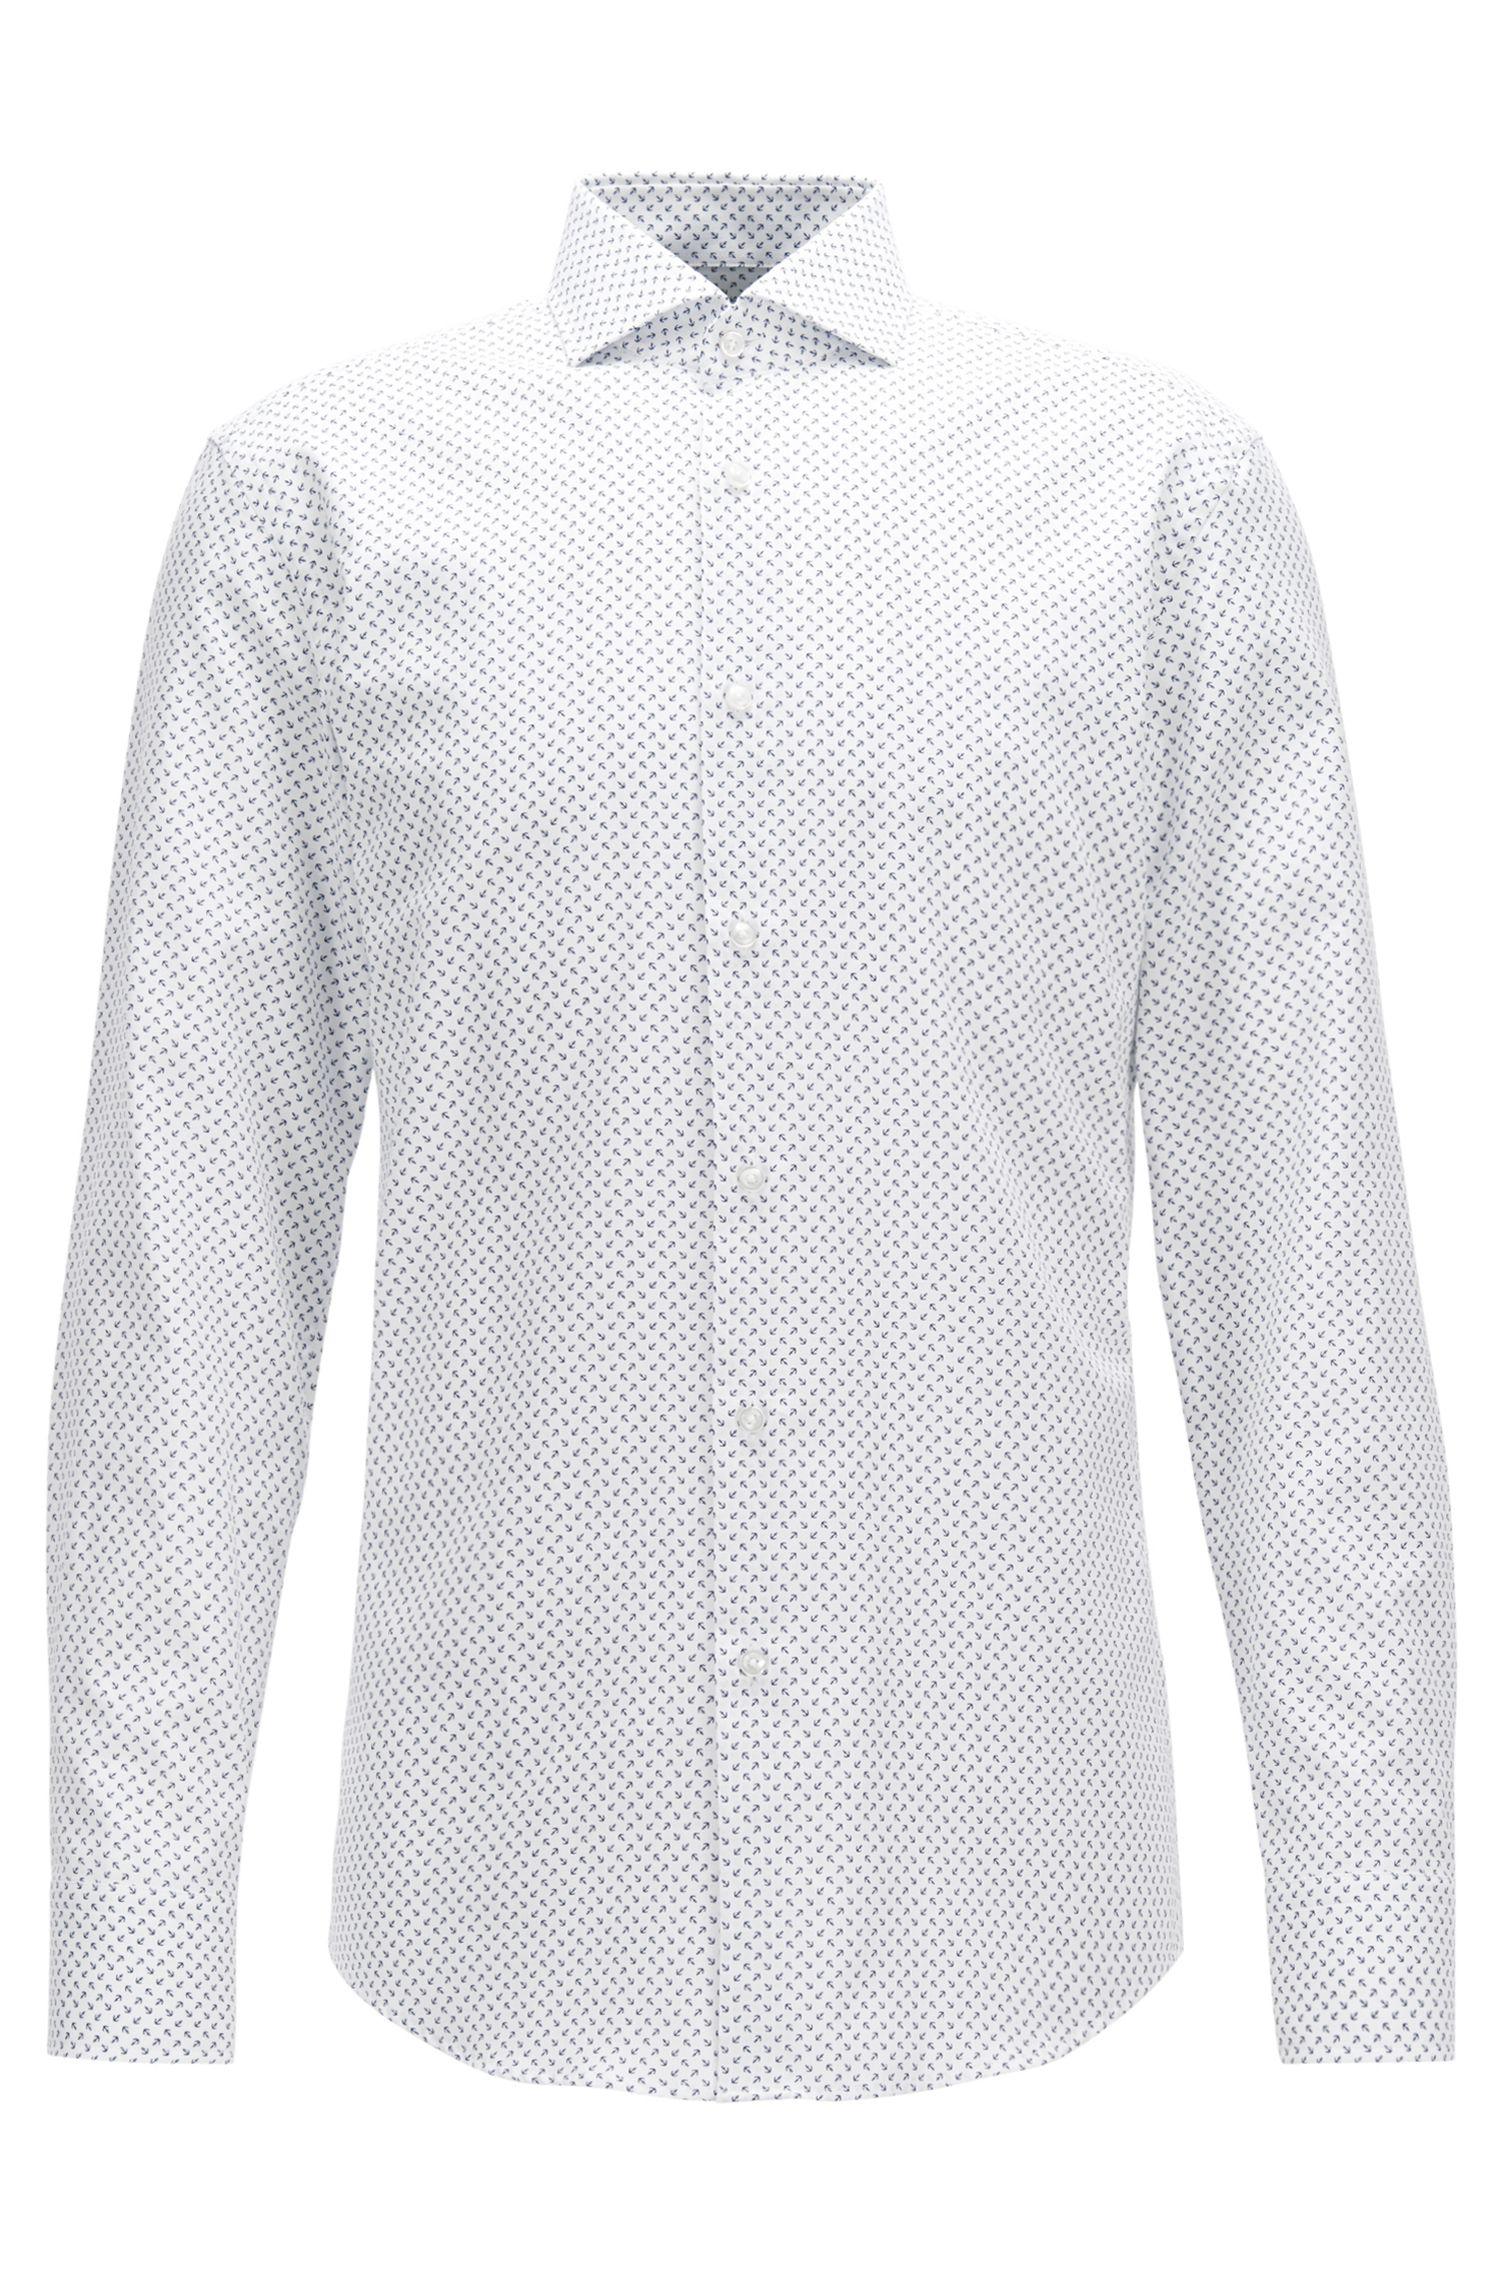 Printed Cotton Dress Shirt, Slim Fit | Jason